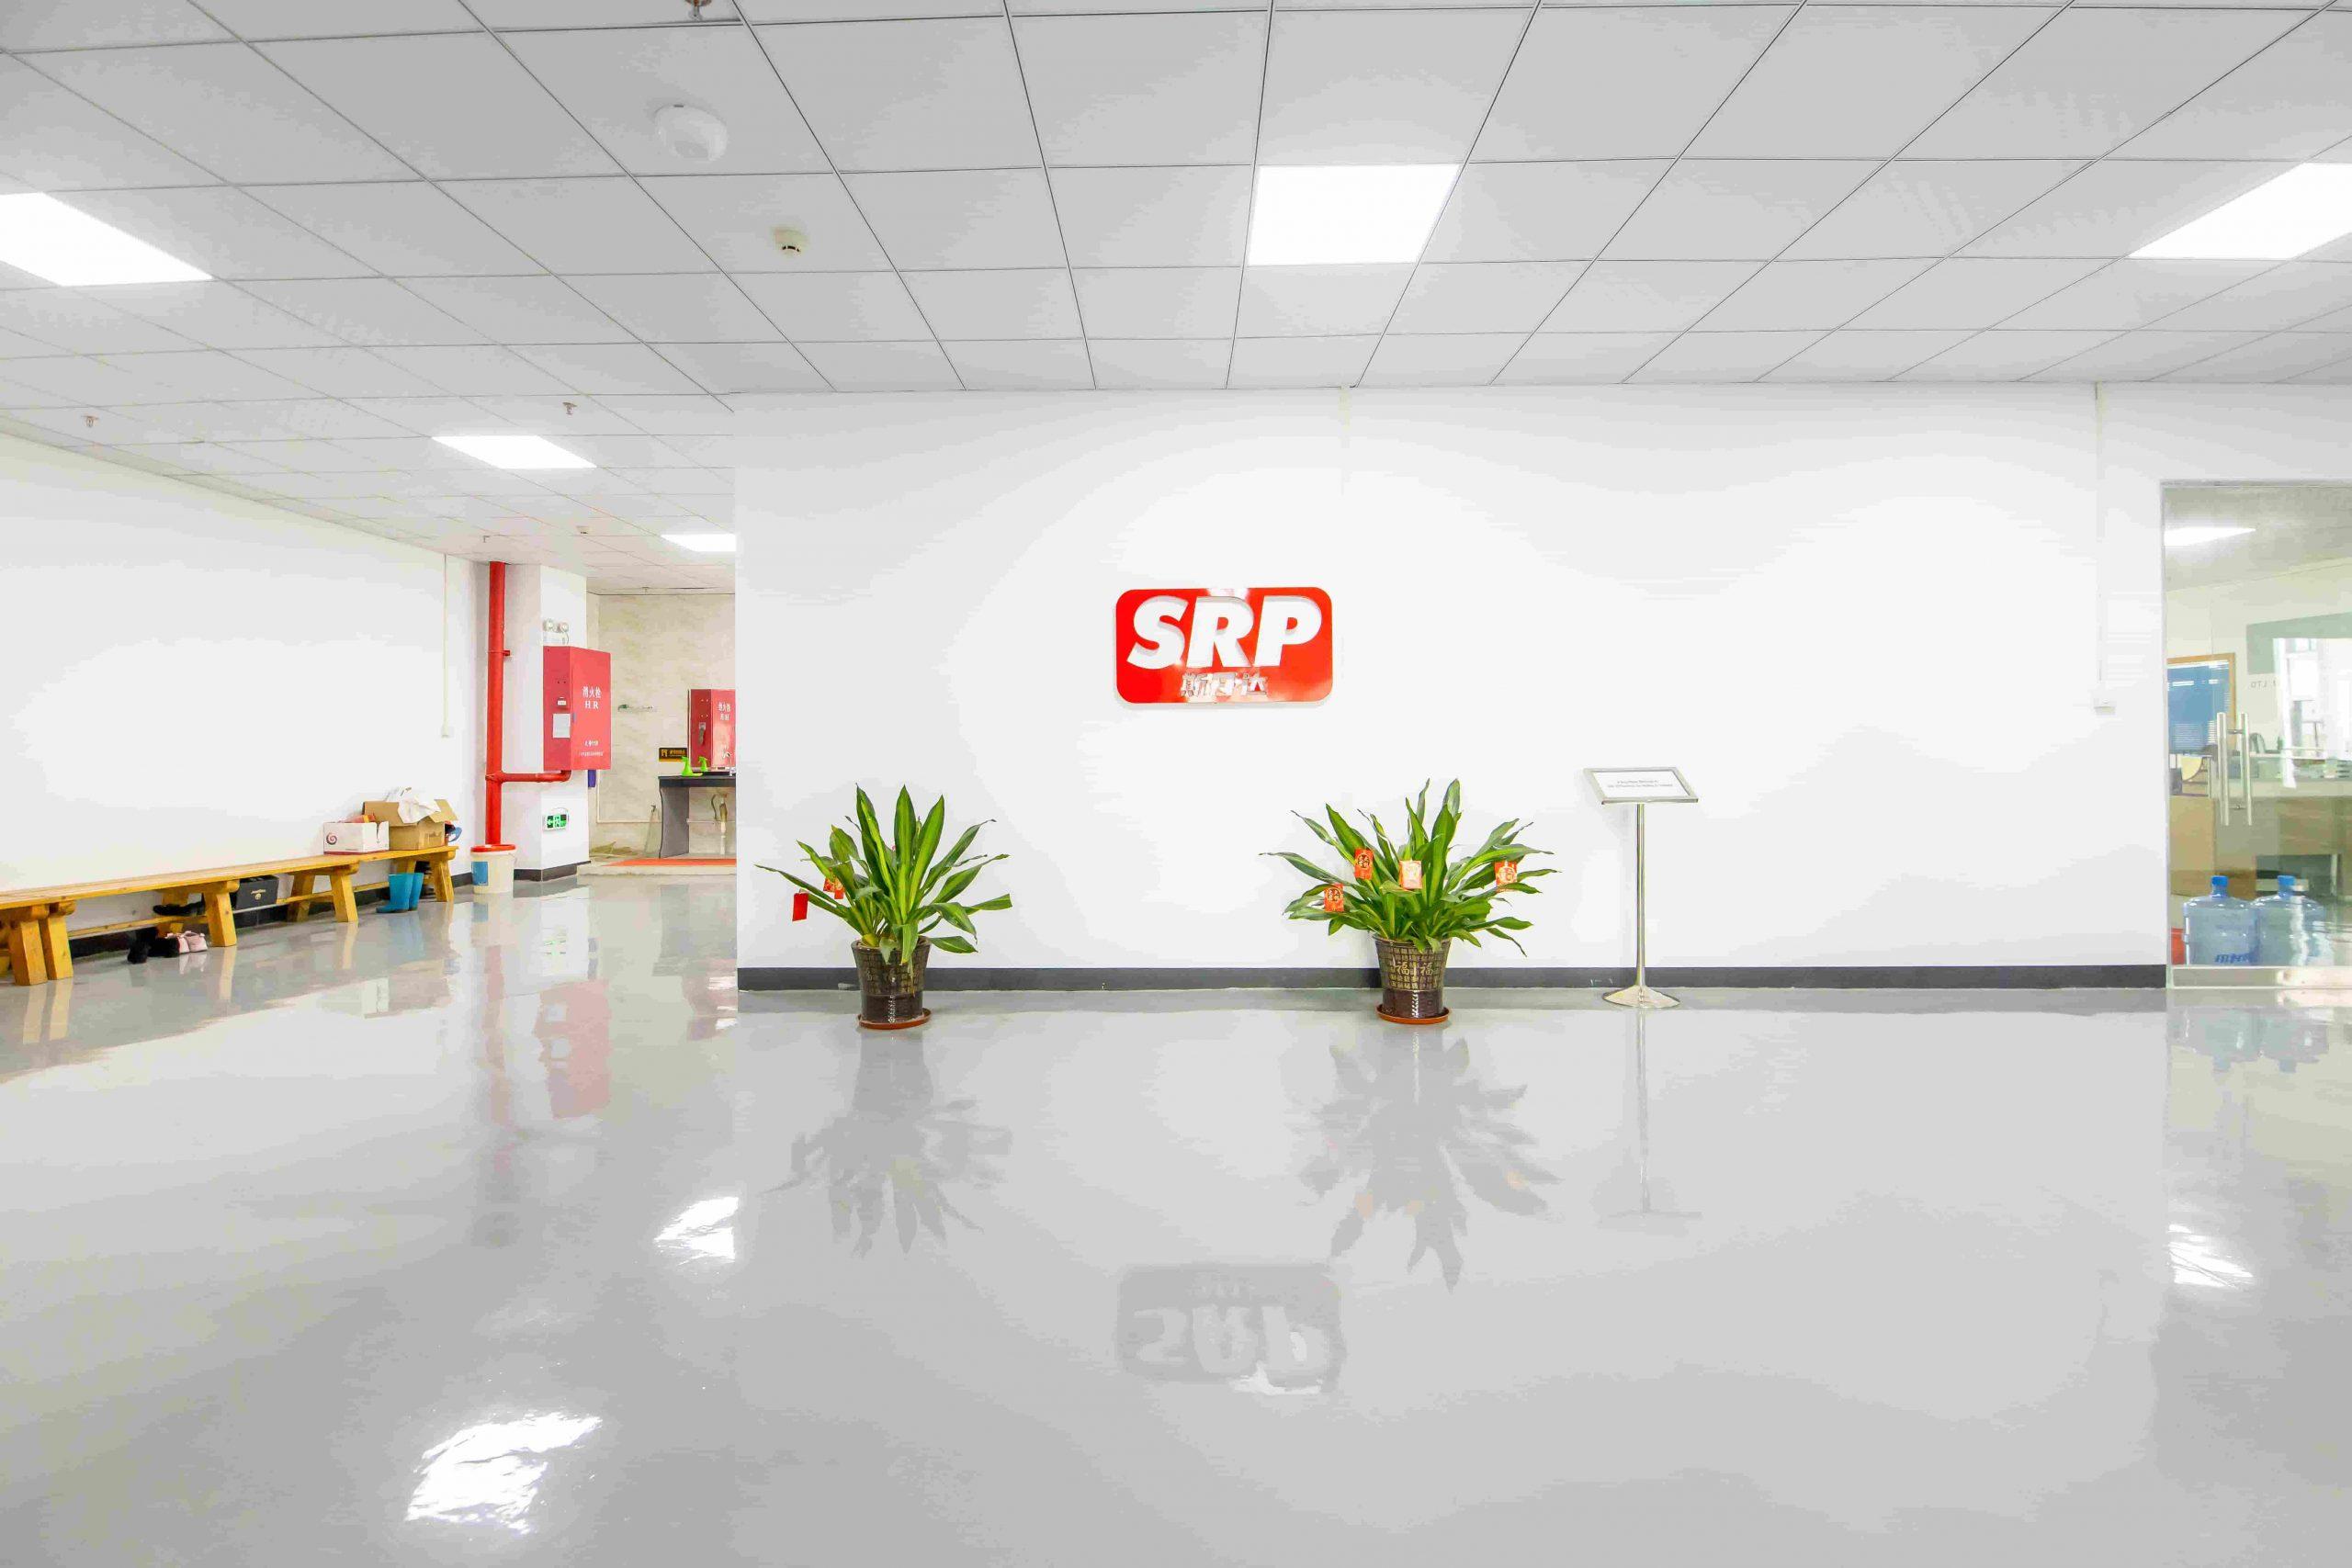 SRP斯丹达|新能源汽车销量全线突破,轻量化与电池保护已成行业主题